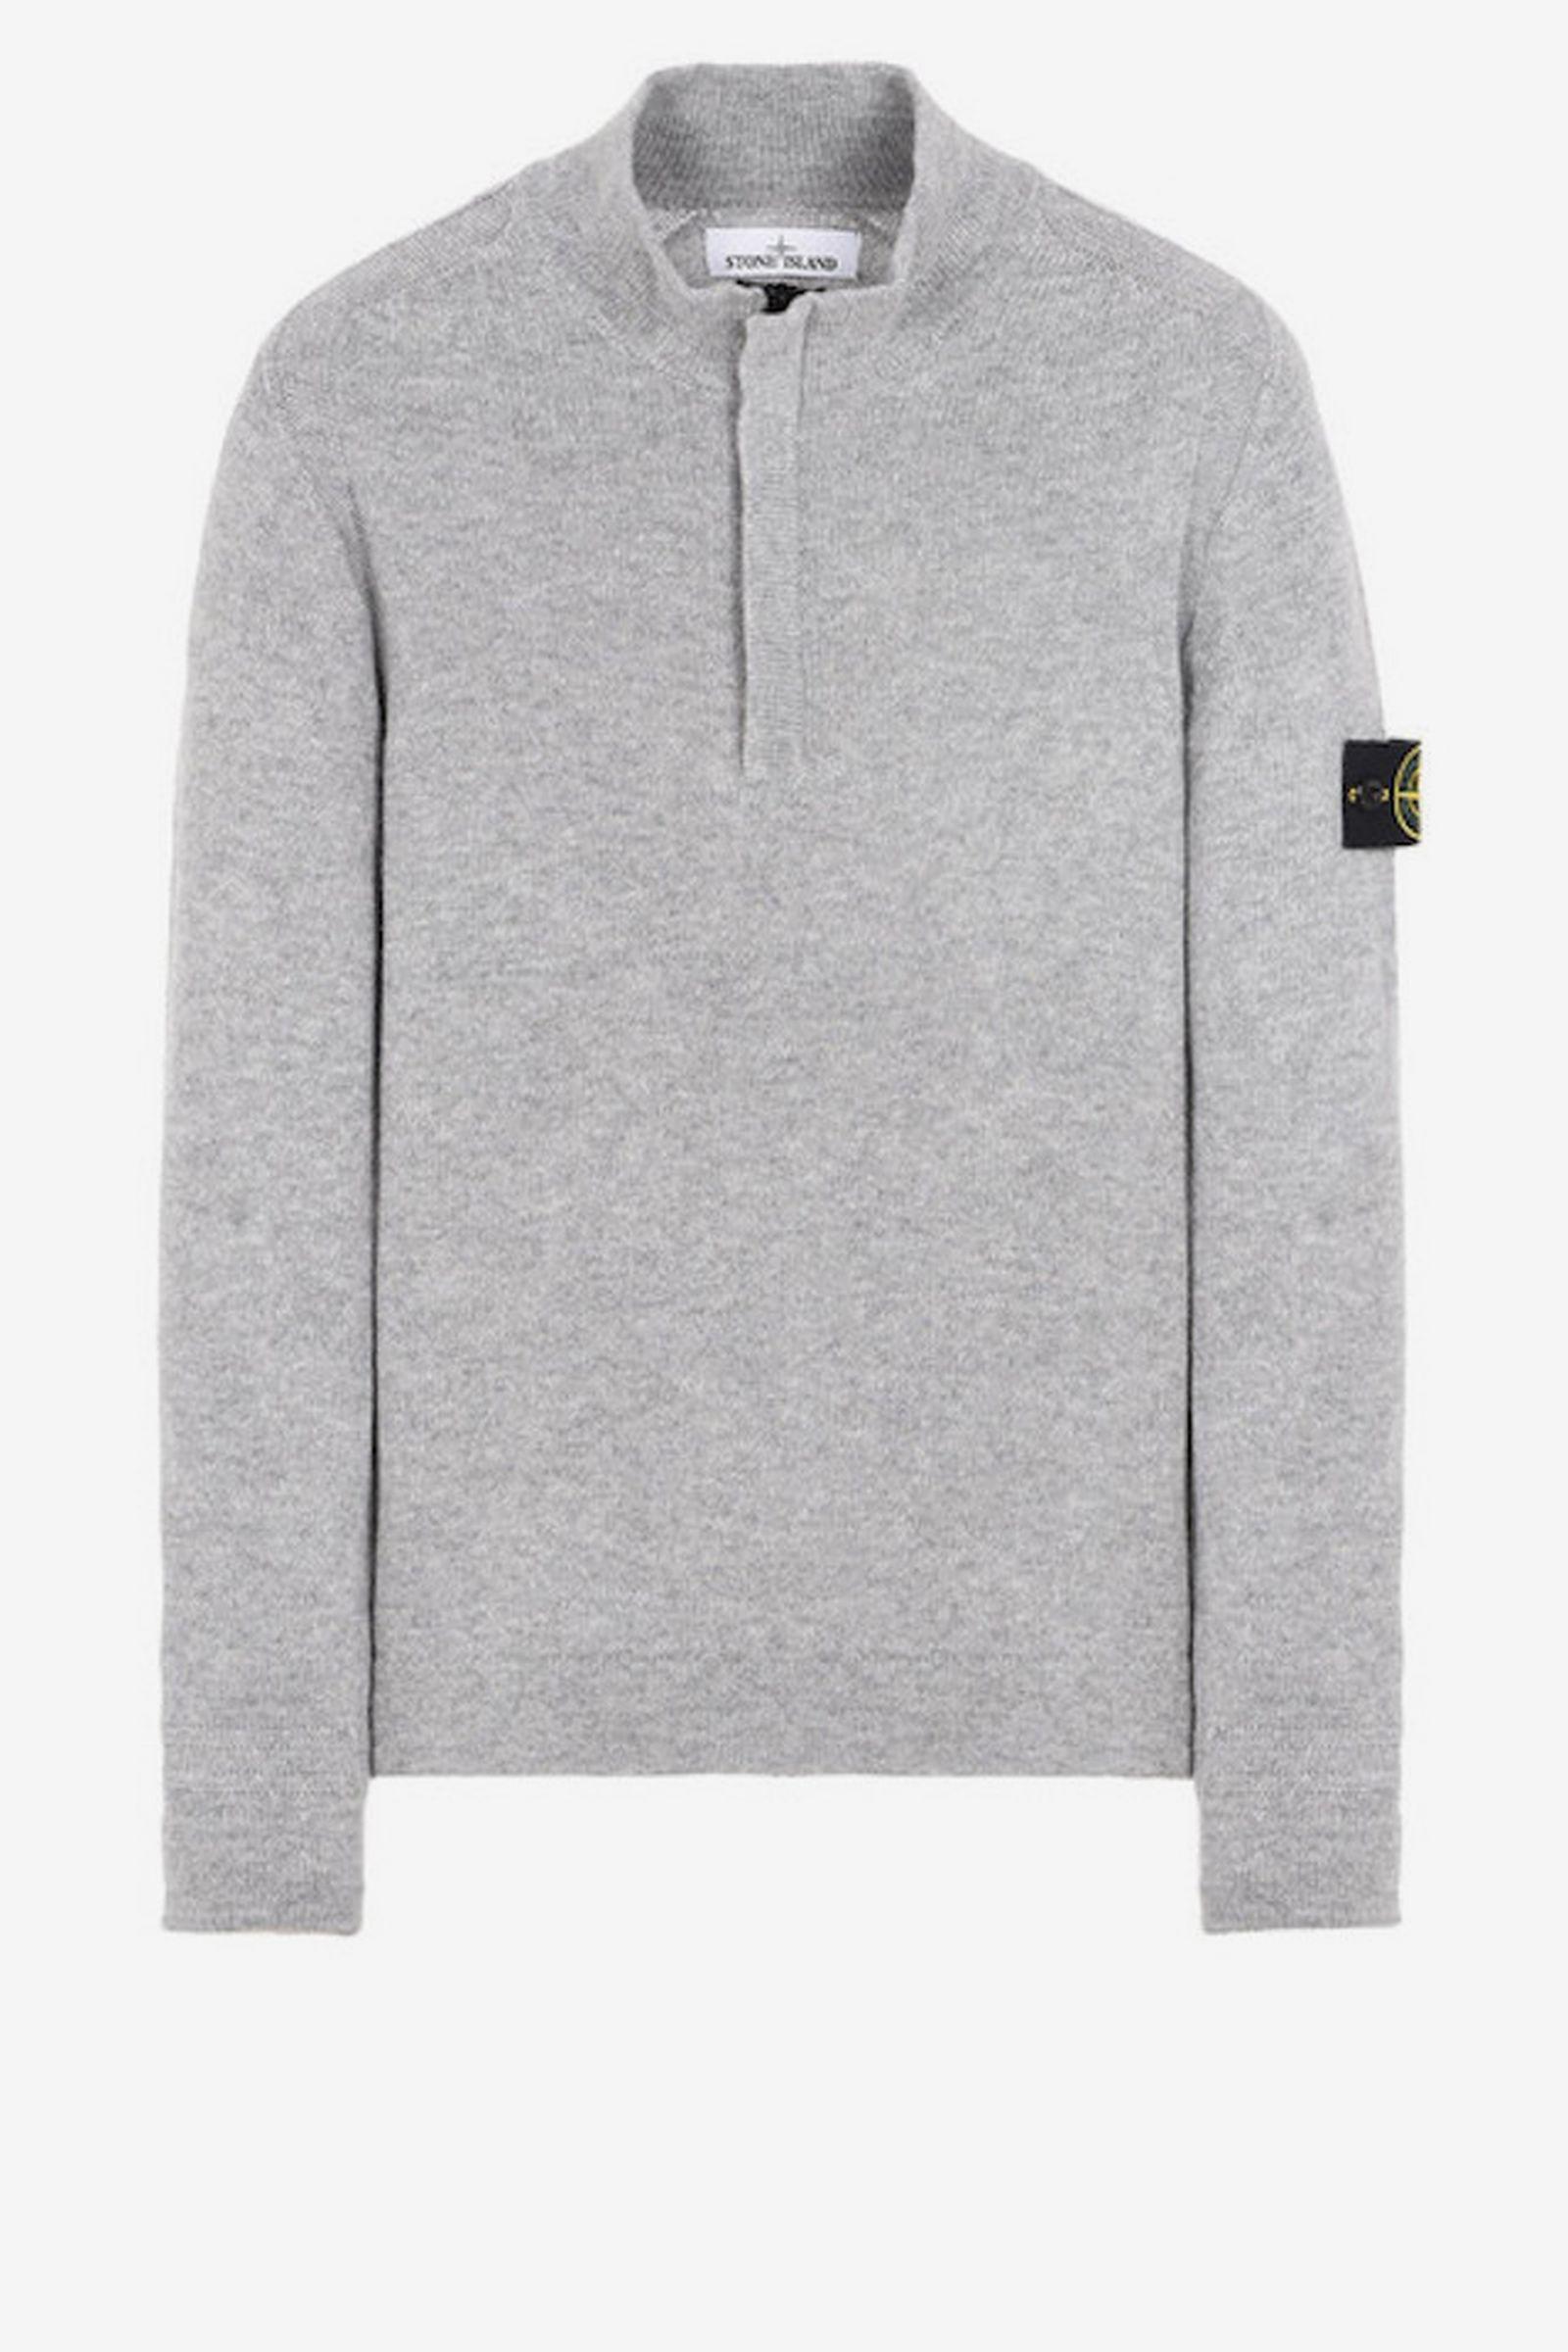 stone island fw18 knitwear